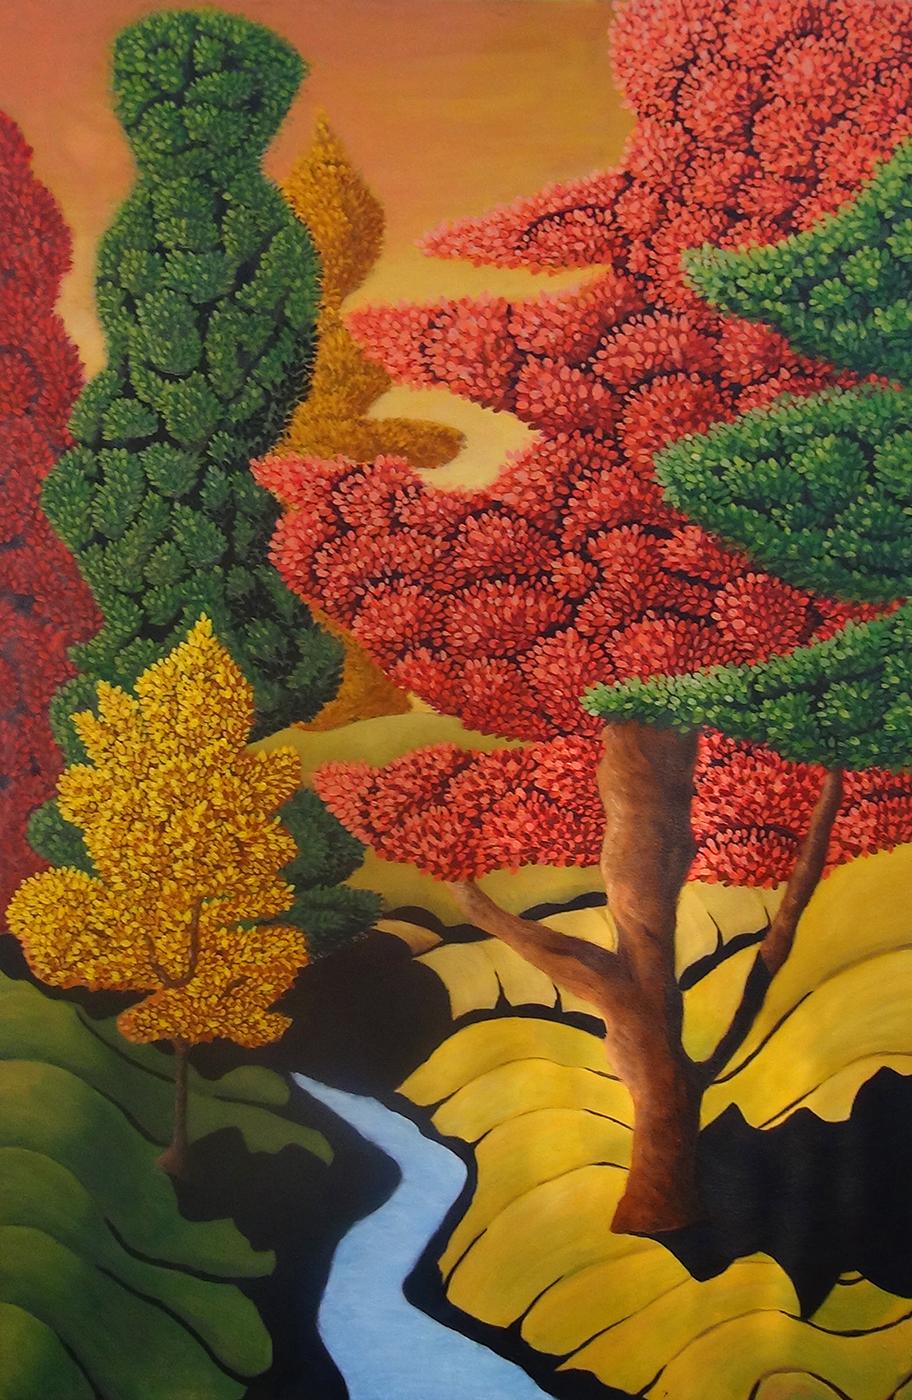 Laura Barat, Mnemonic Trees